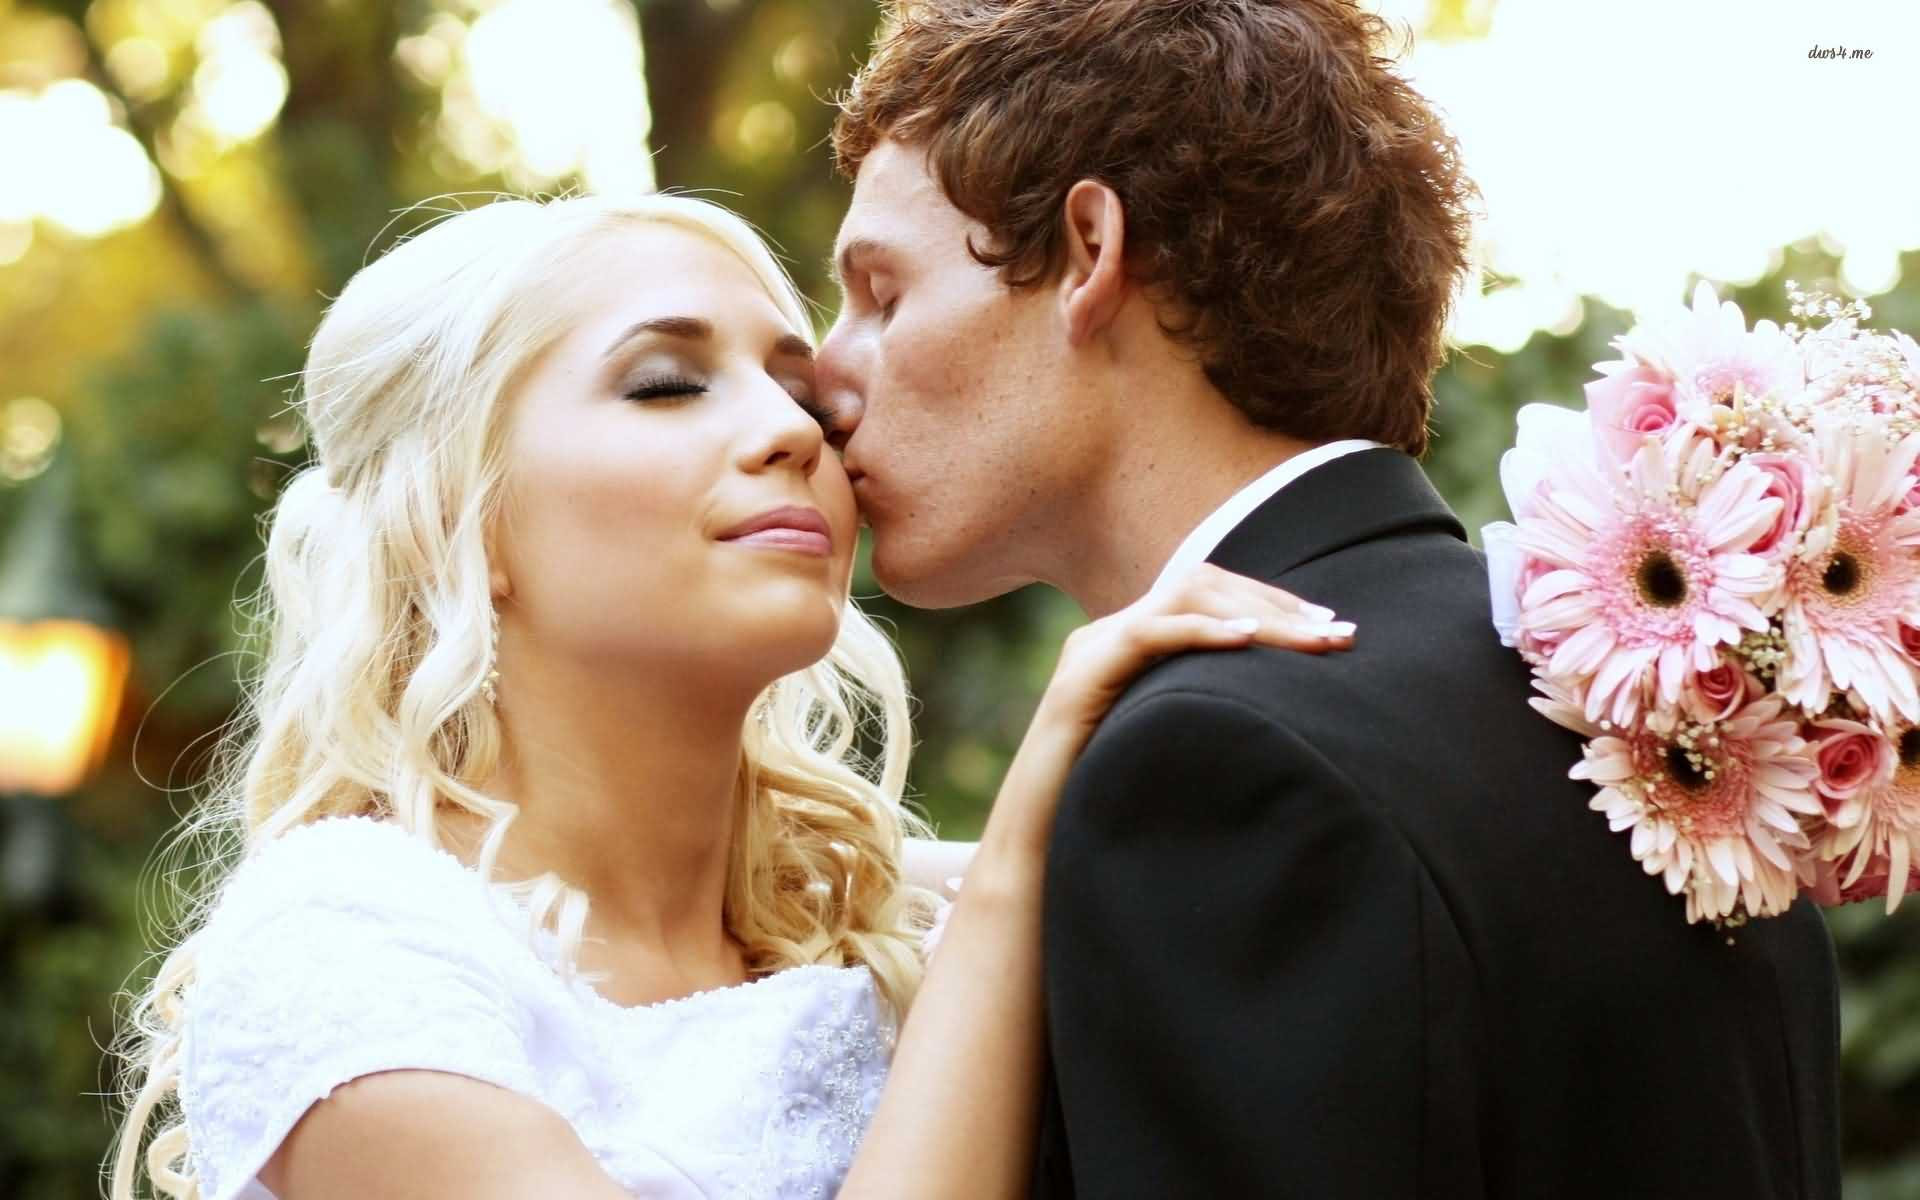 Congratulation Happy Marriage Life Wishes Wallpaper